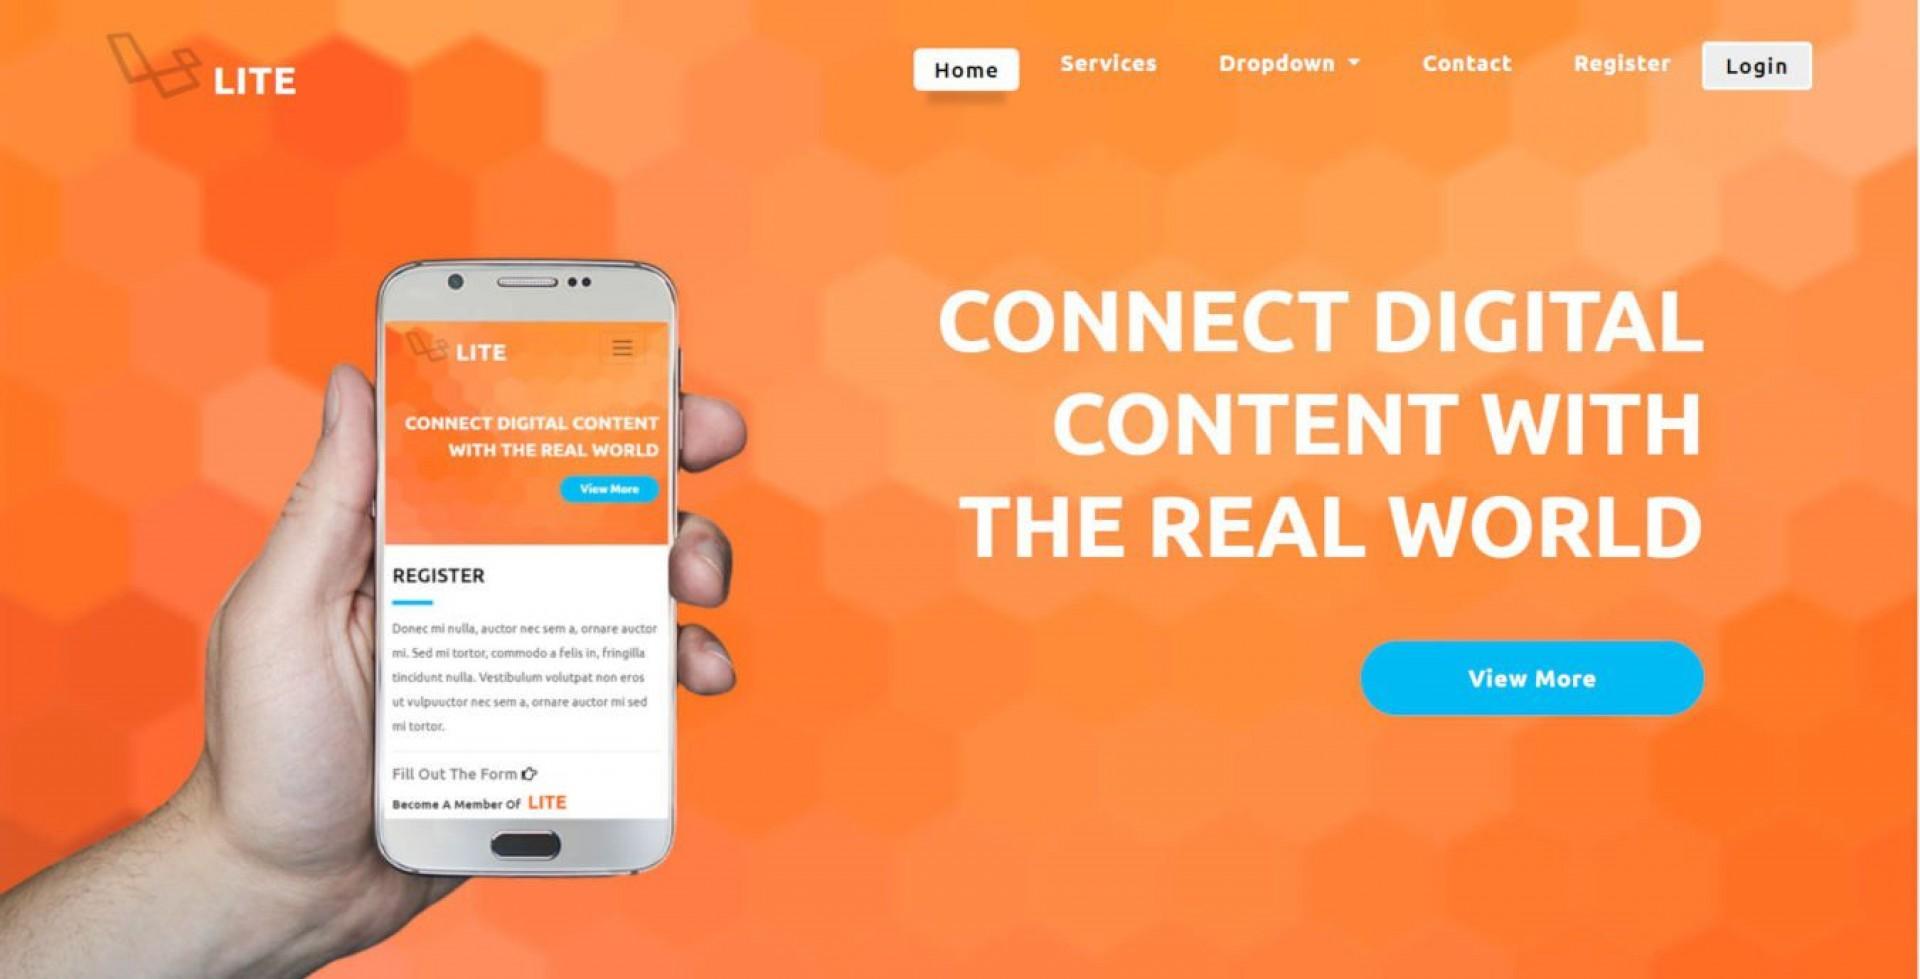 006 Sensational Bootstrap Mobile App Template Highest Quality  Html5 Form 41920